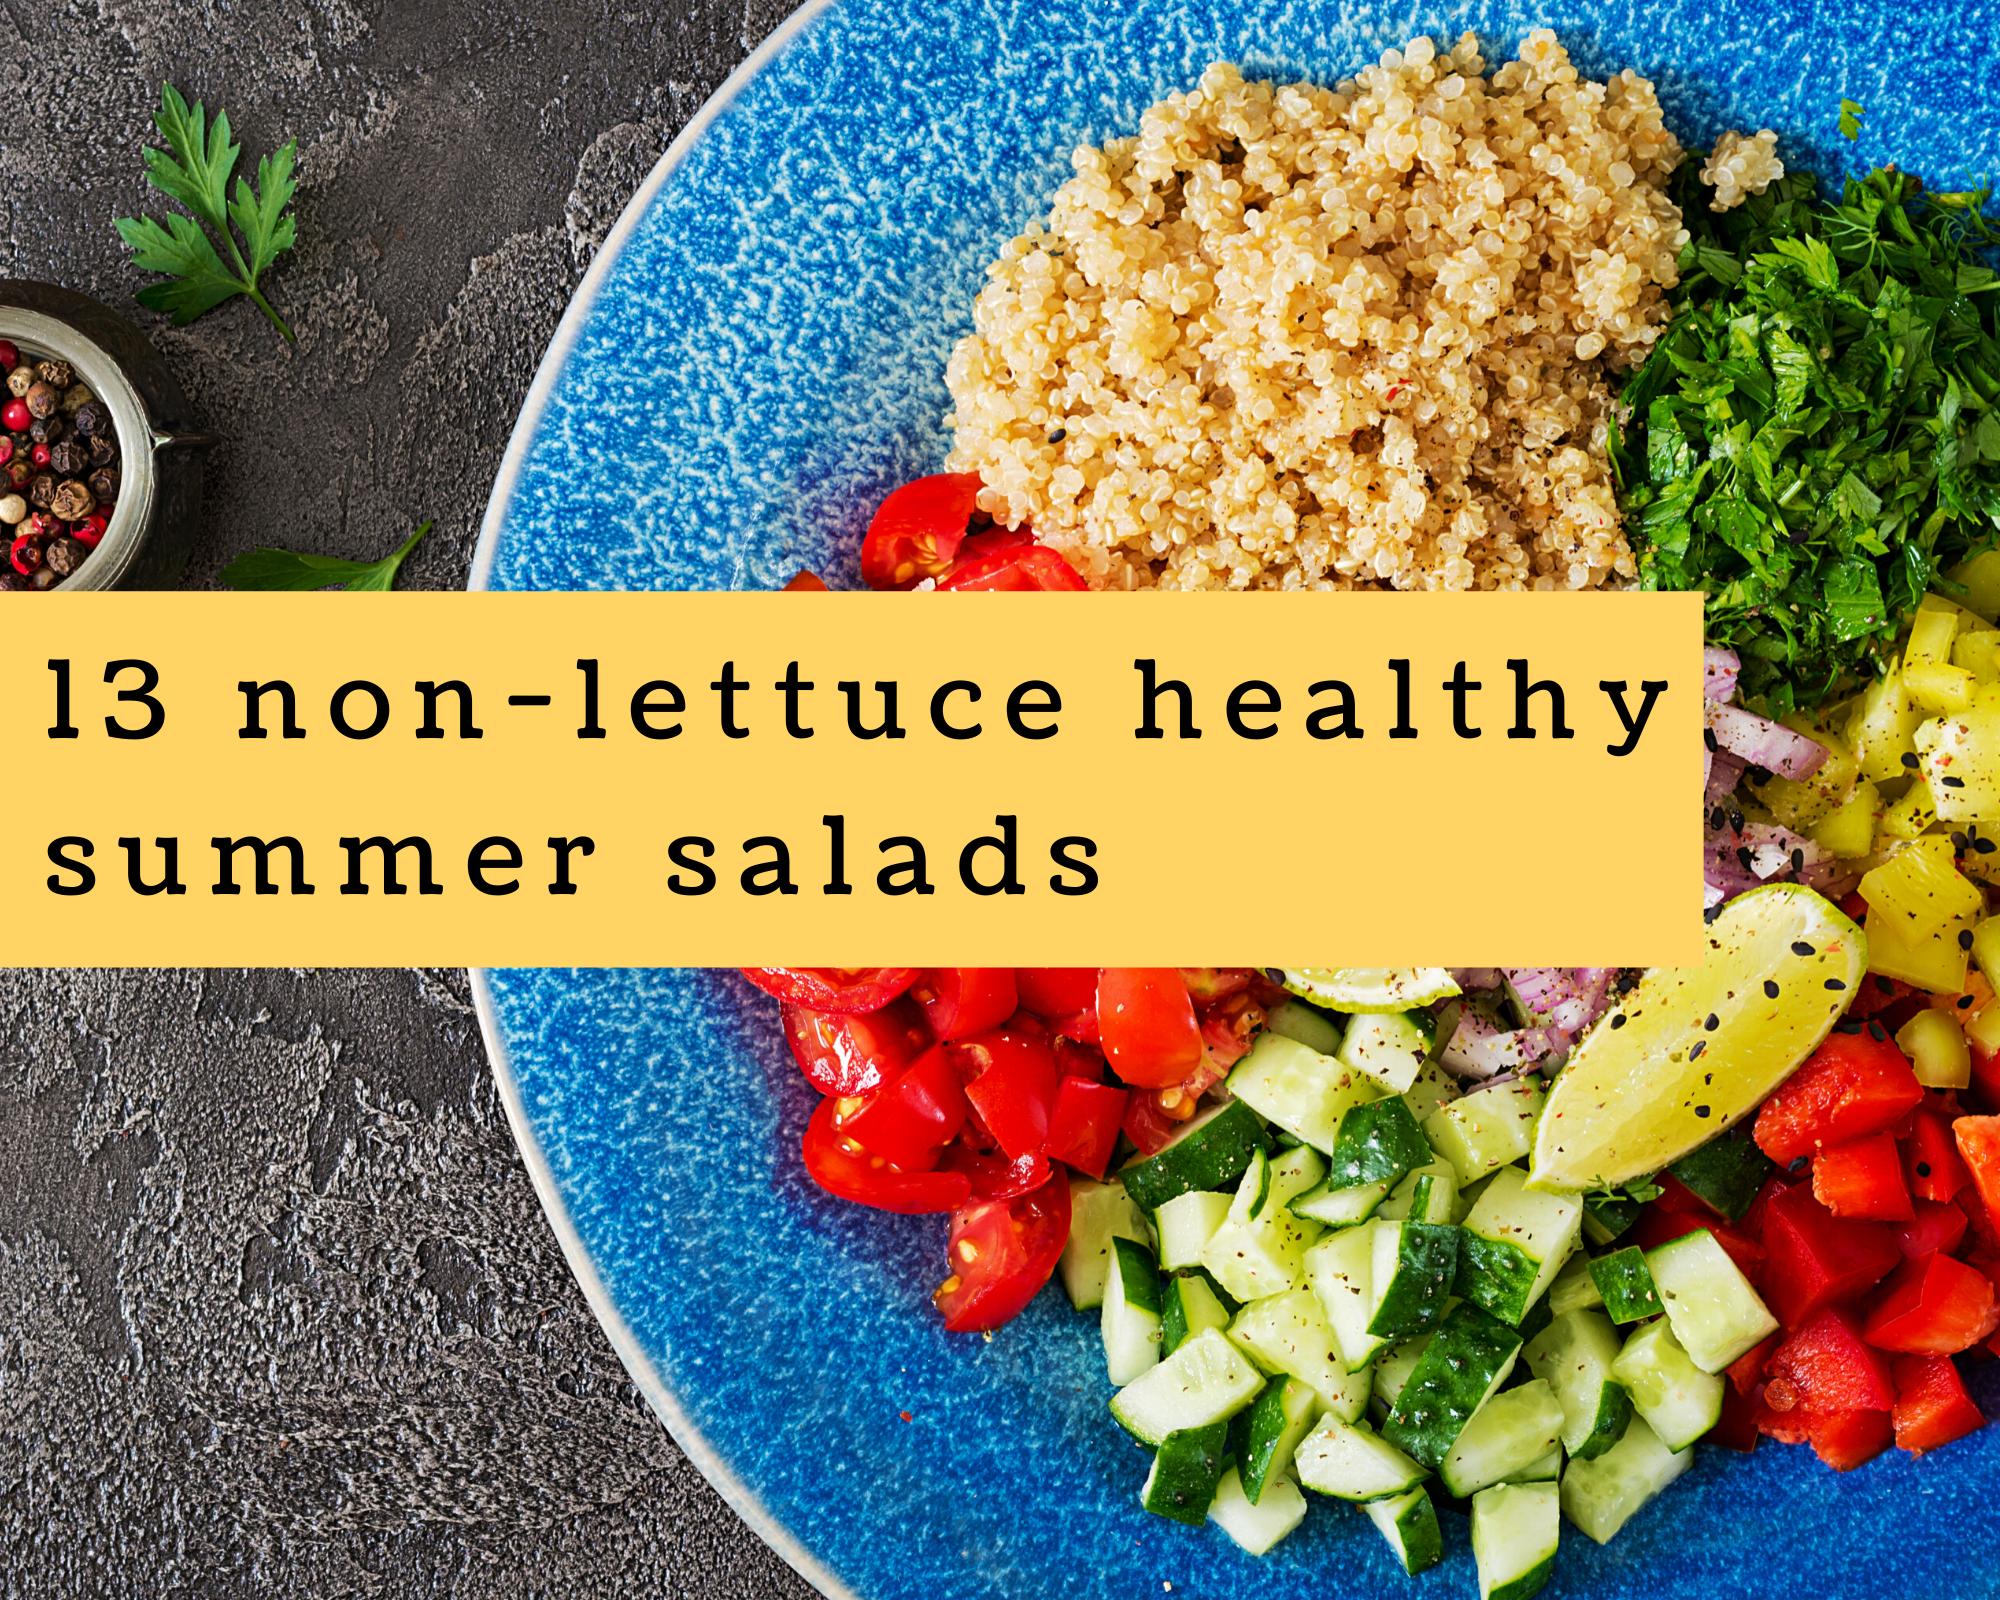 Quinoa salad recipe and other summer salads